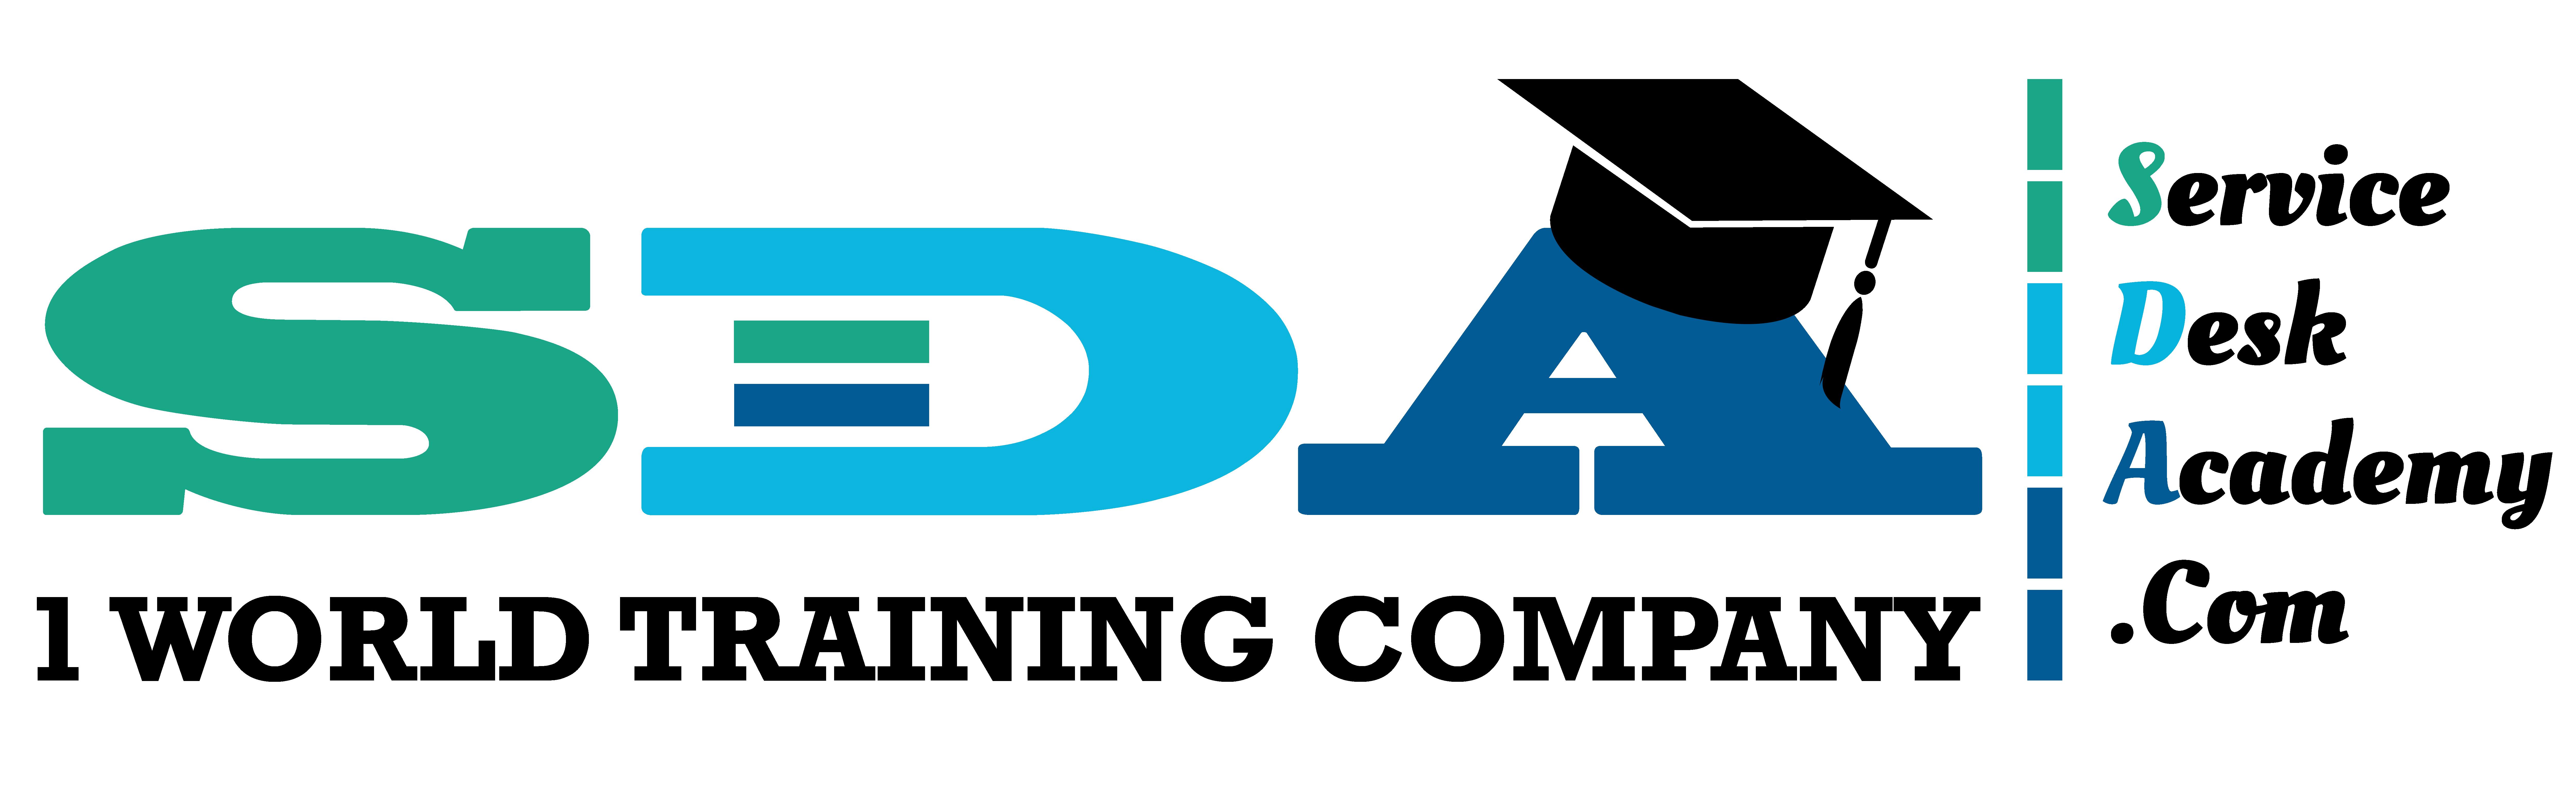 ServiceDesk Academy